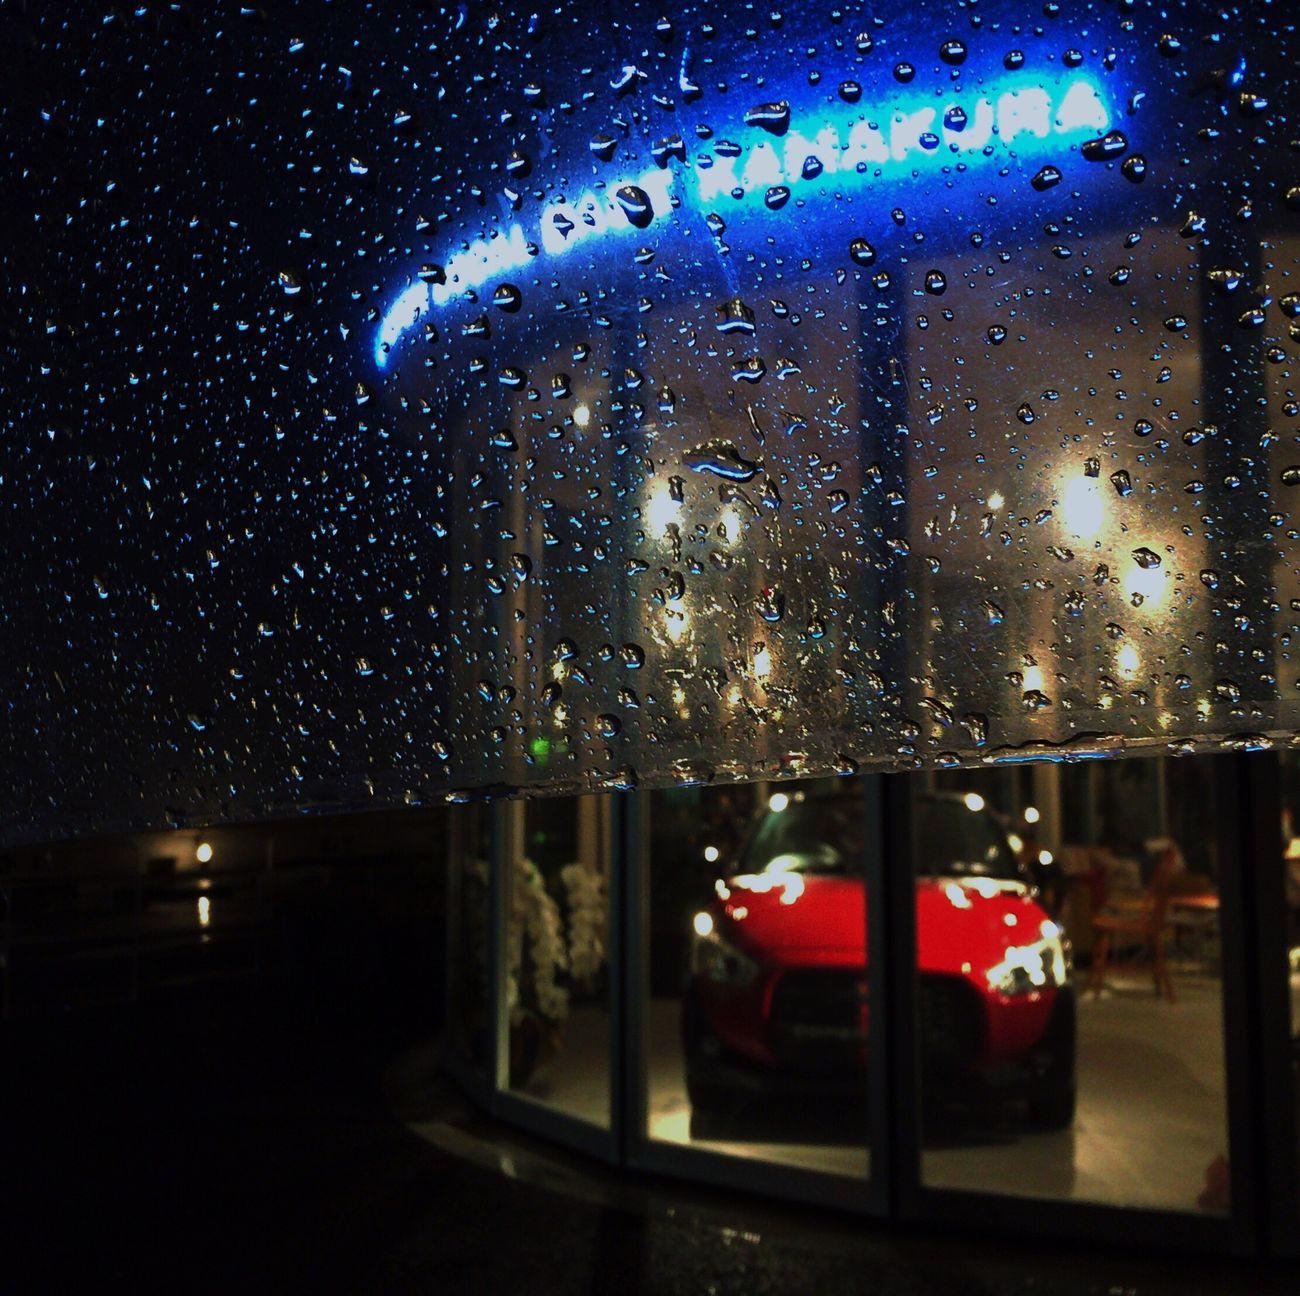 Raindrops Nightphotography Red&blue